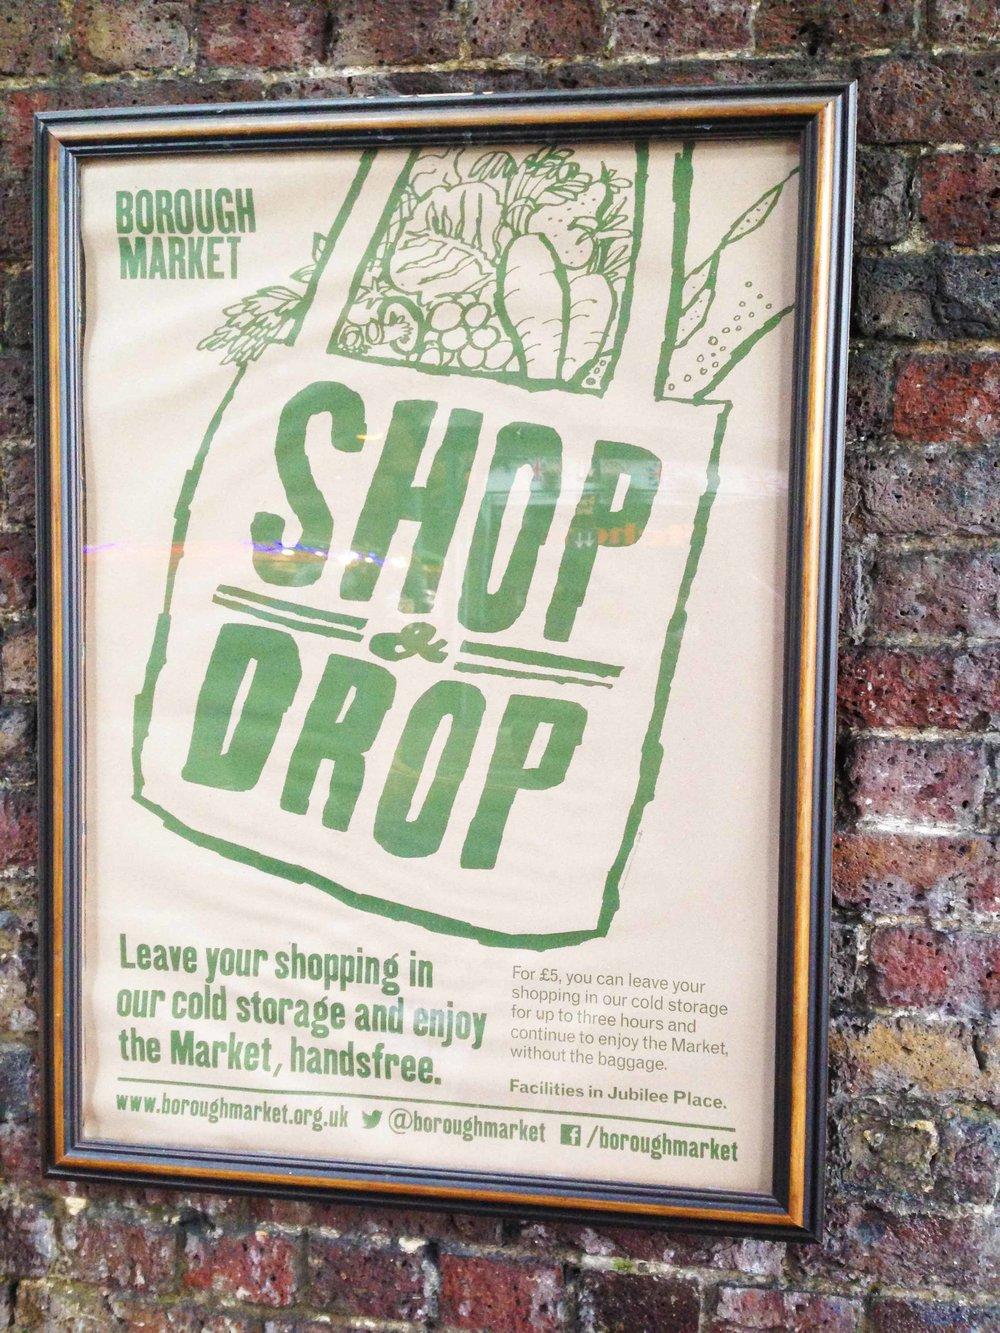 Borough-Market-shop-and-drop-poster.jpg